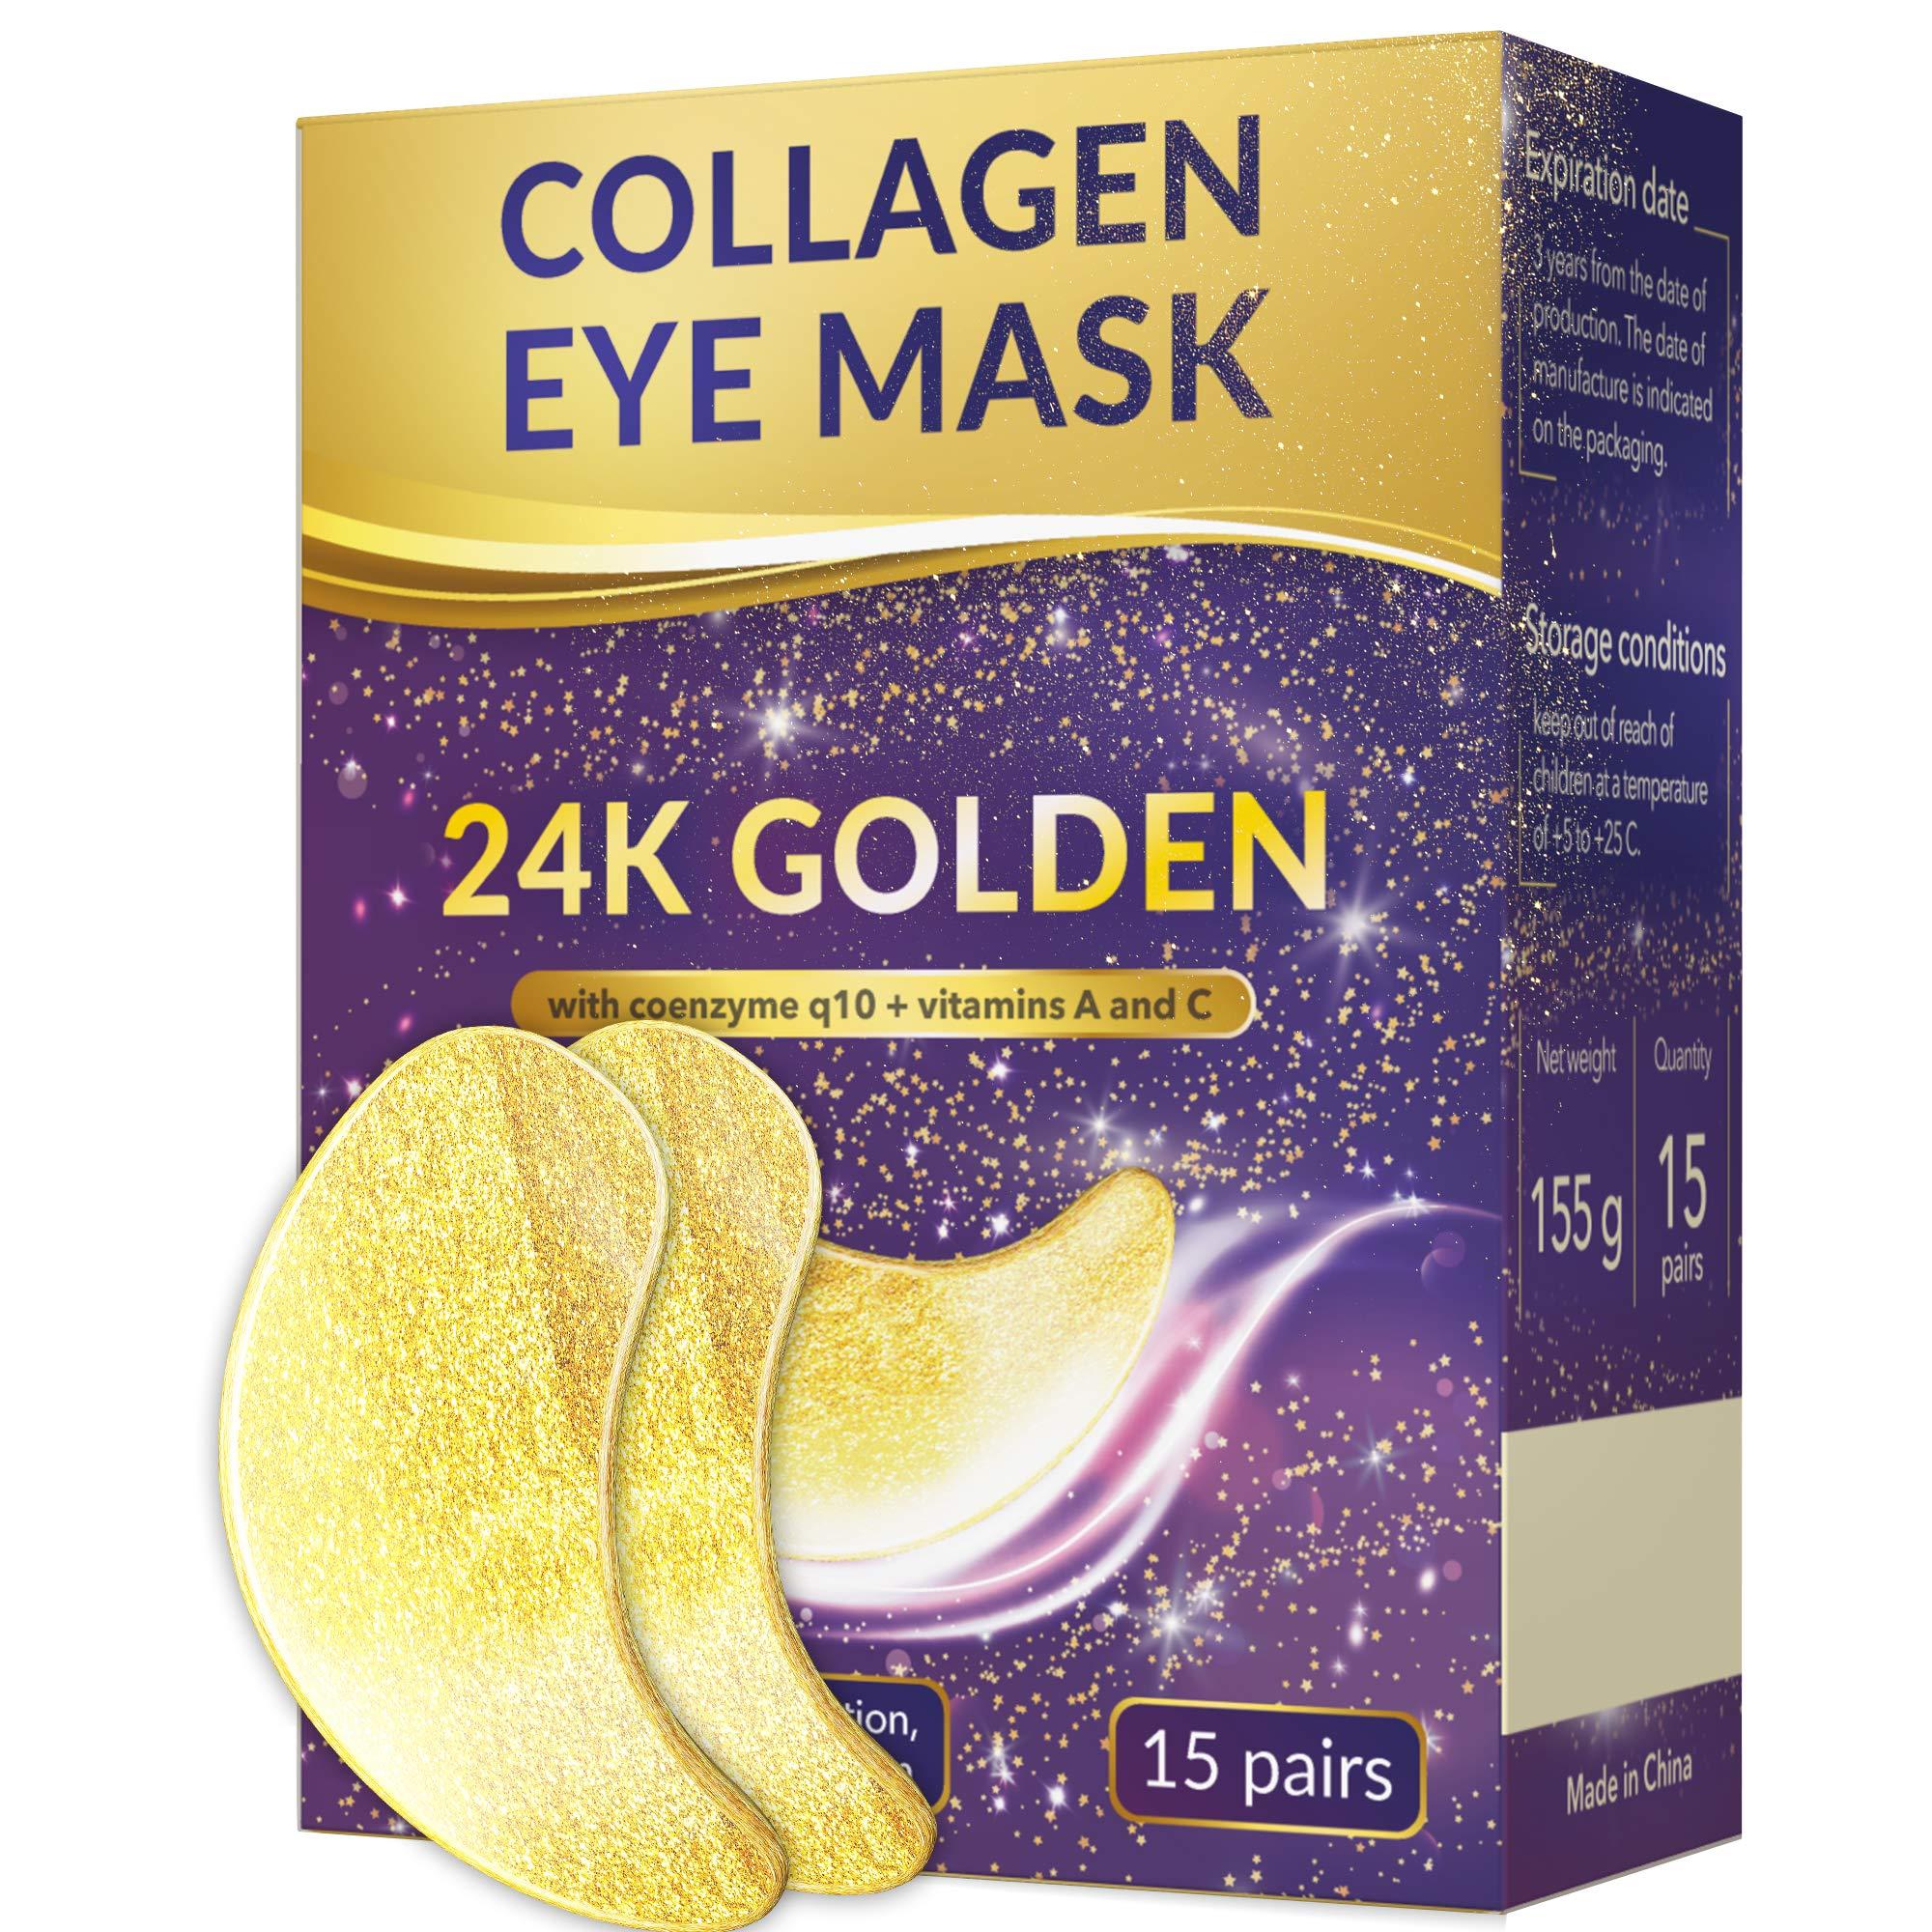 24k gold eye mask - Under Eye Patches - Under Eye Bags Treatment - Collagen Eye Mask - Hyaluronic acid eye mask - Reducing Dark Circles - Eye gel patches - Vitamin C eye mask - Hydrogel patches by AlfaMark